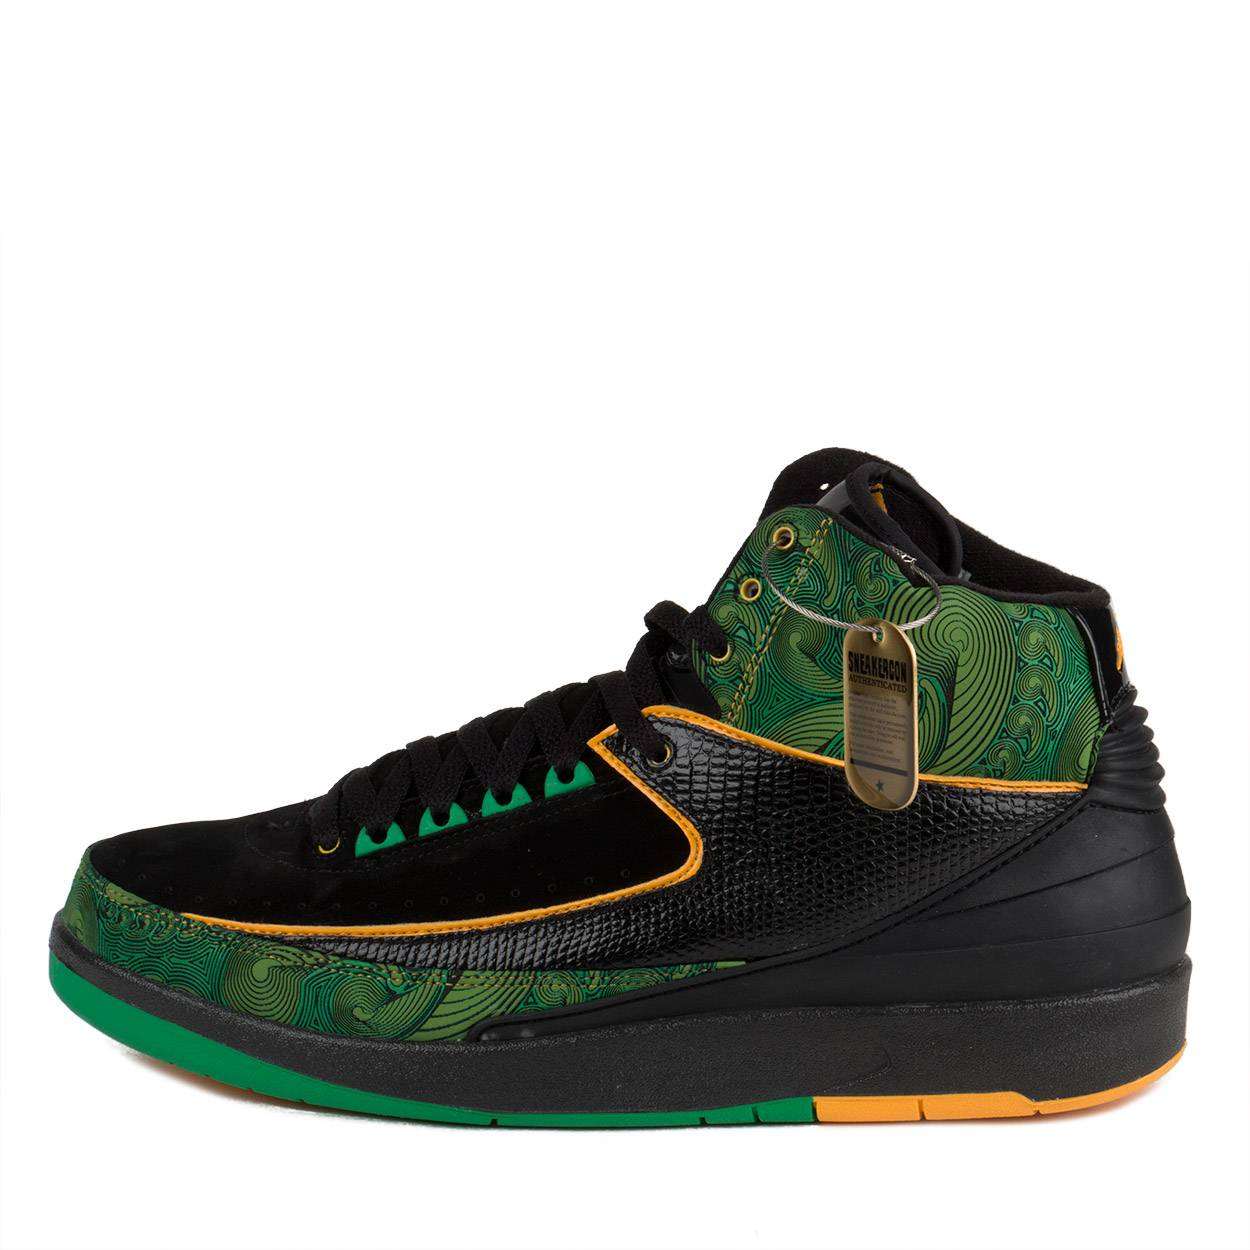 0e1fbee15fdf0e Nike Mens Air Jordan 2 Retro High DB Doernbecher Black Gold-Green 318304-071